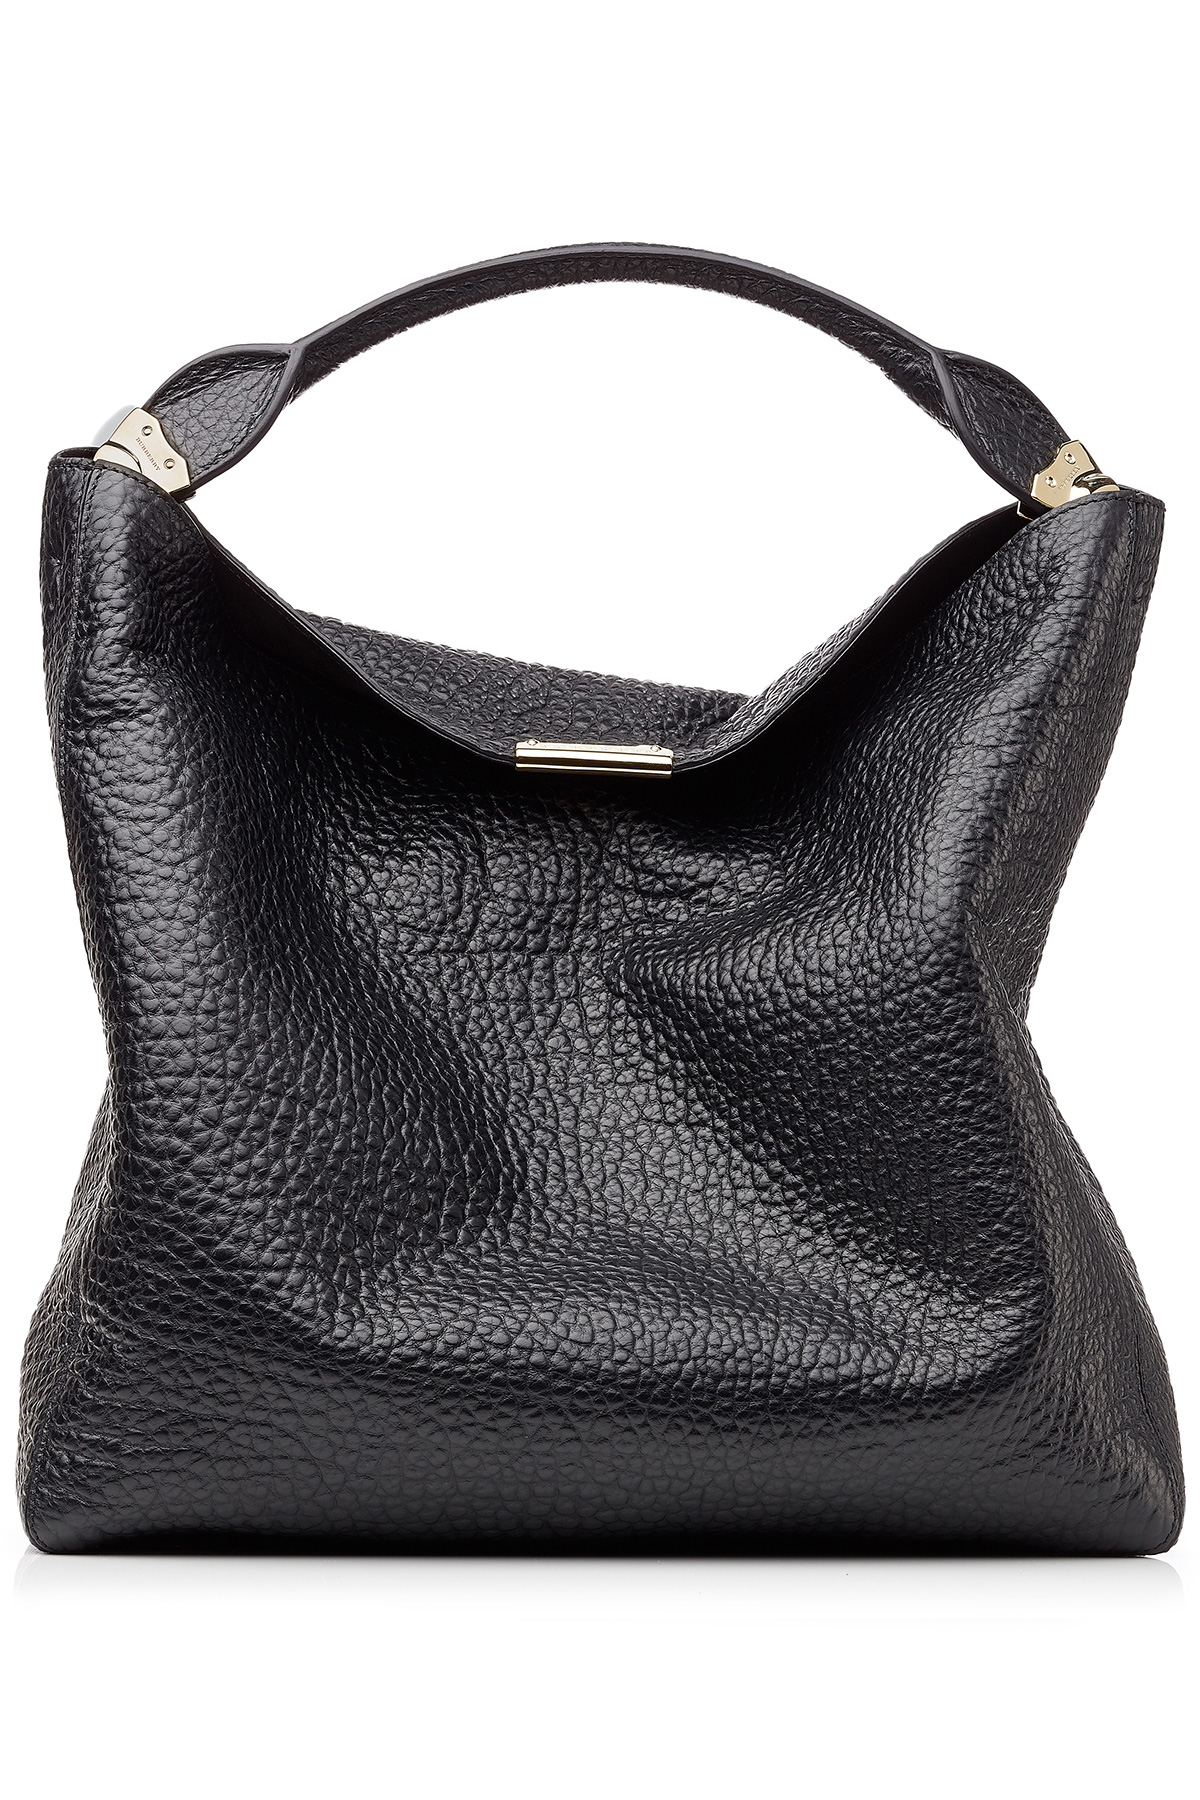 443f58fc57e0 Lyst - Burberry Lindburn Embossed Leather Hobo Bag - Black in Black